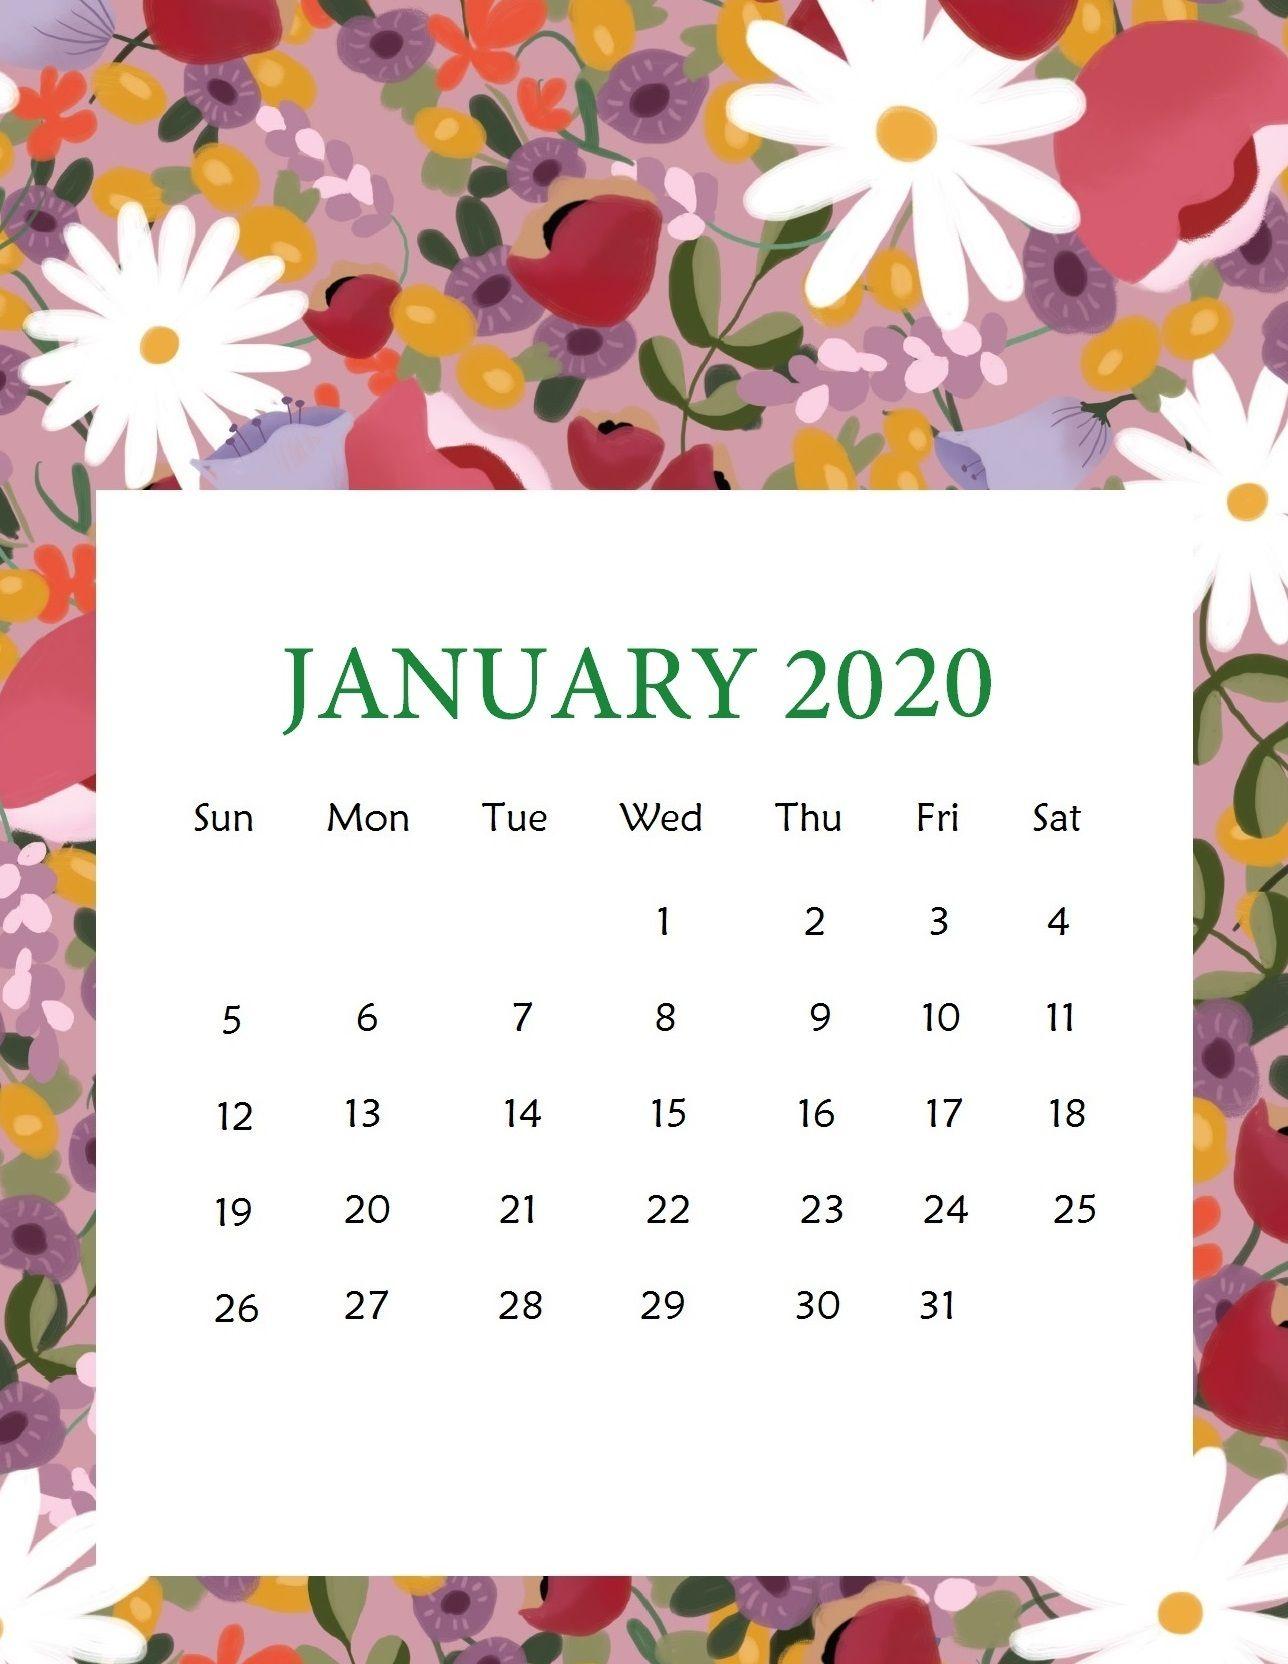 Cute January 2020 Calendar For Classroom Management   Free ...